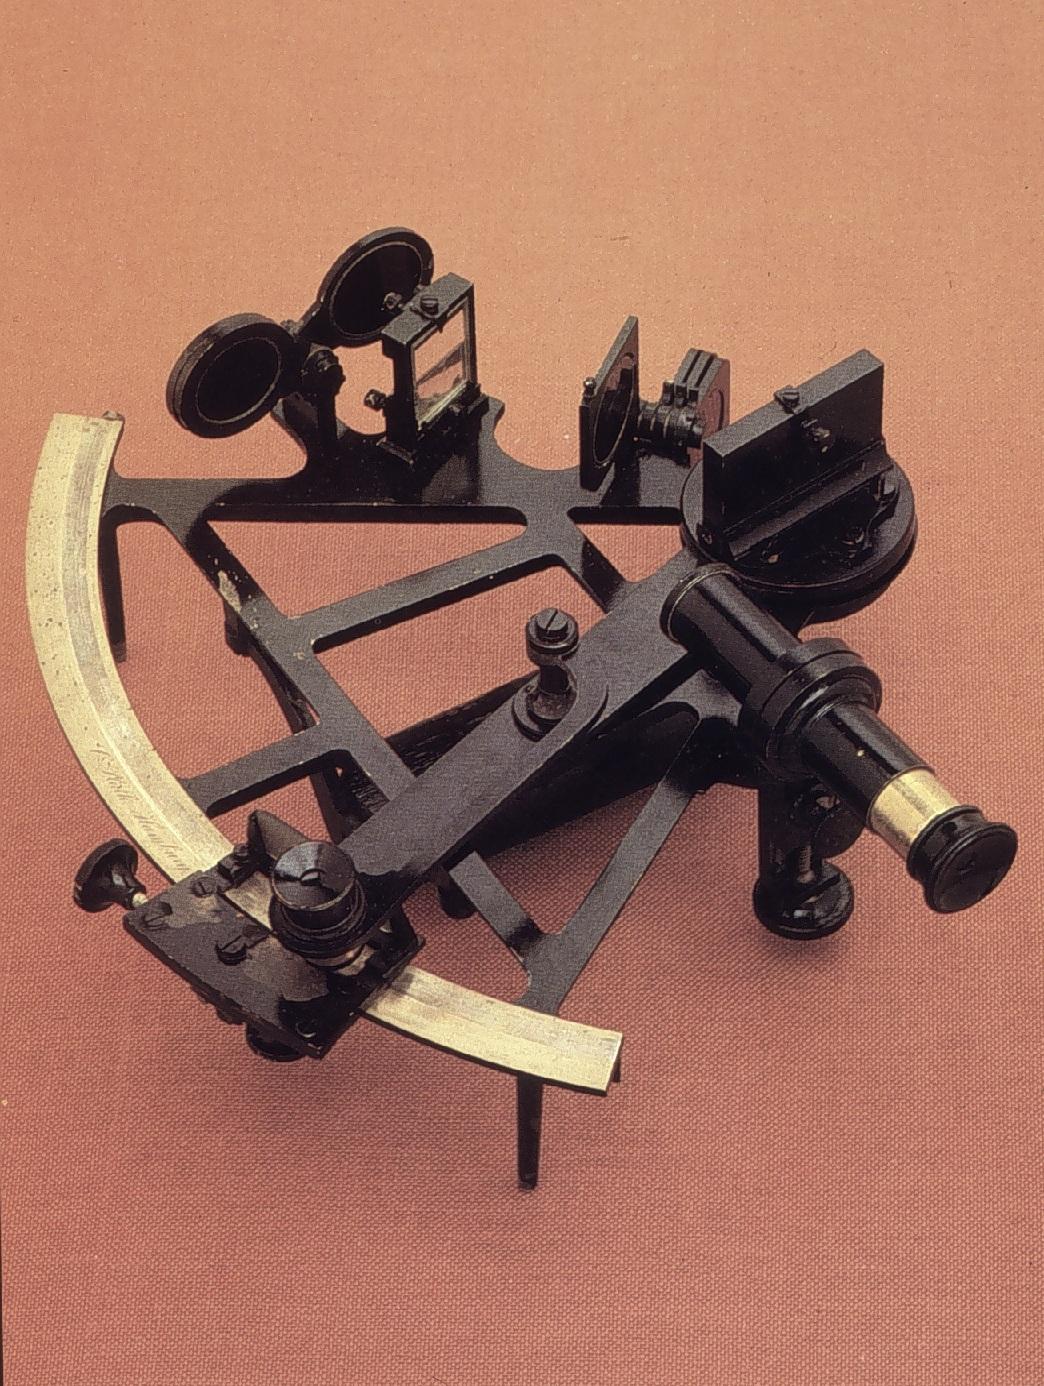 Partes de un sextante marino